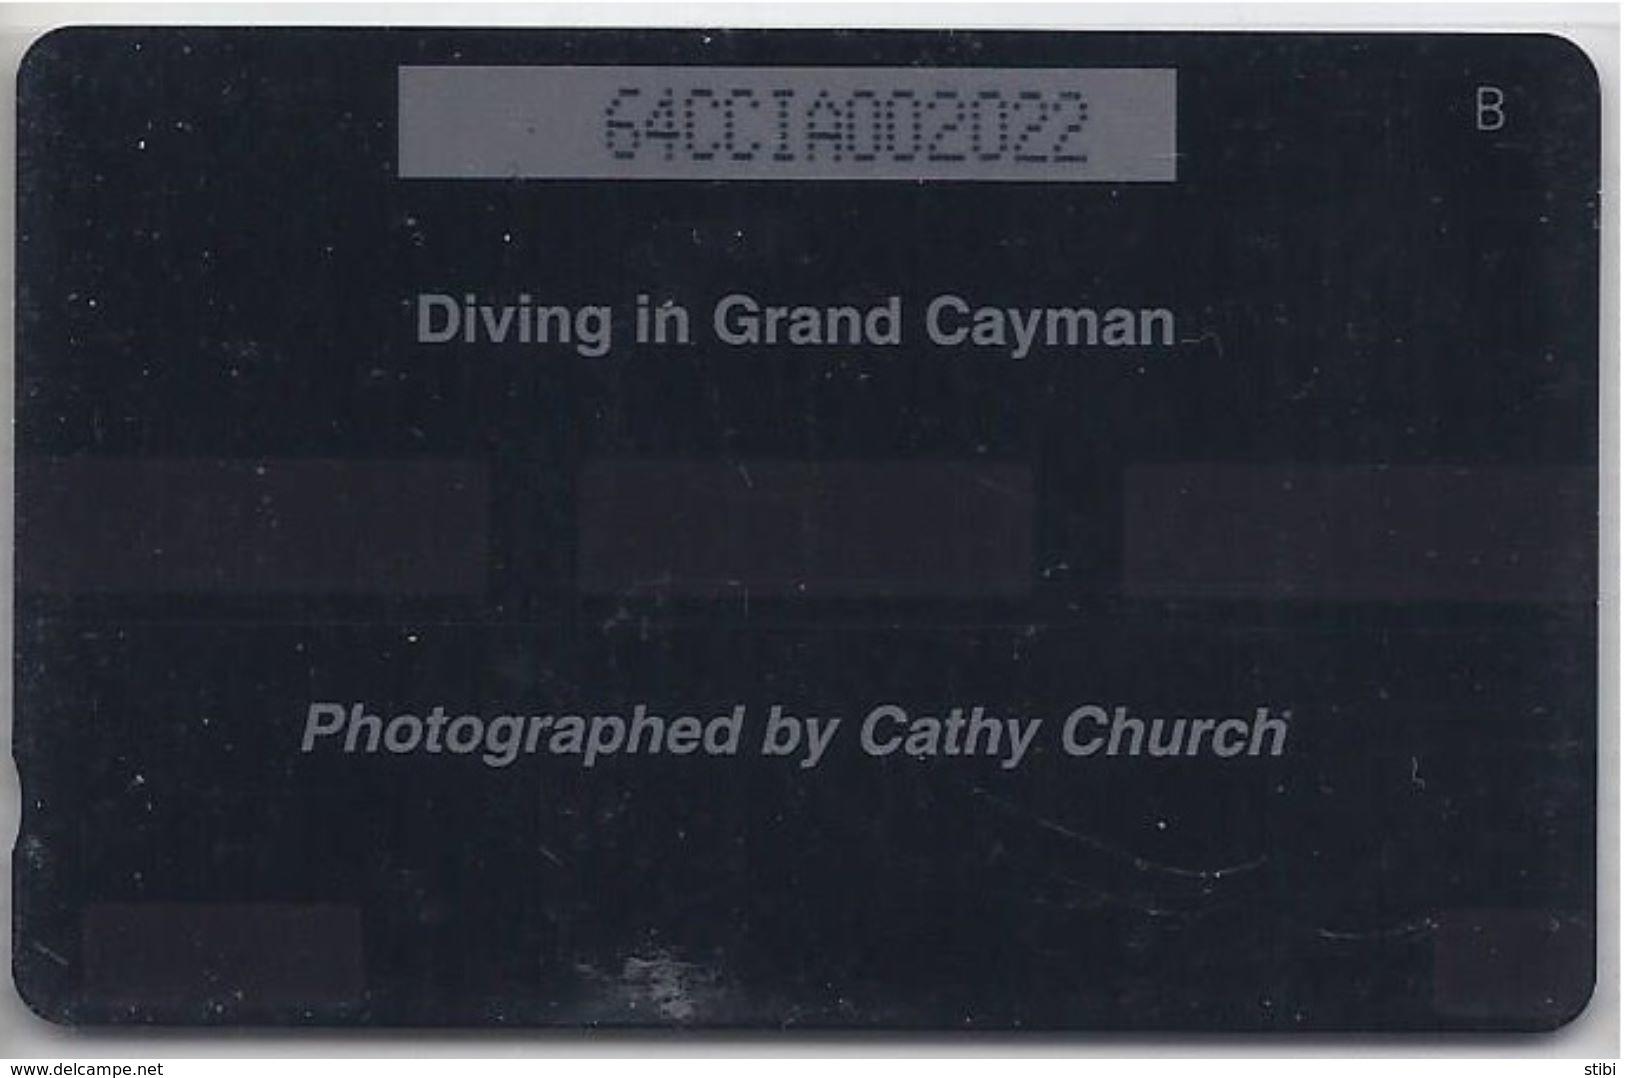 CAYMAN ISLANDS - DIVING IN GRAND CAYMAN - 64CCIA - Cayman Islands